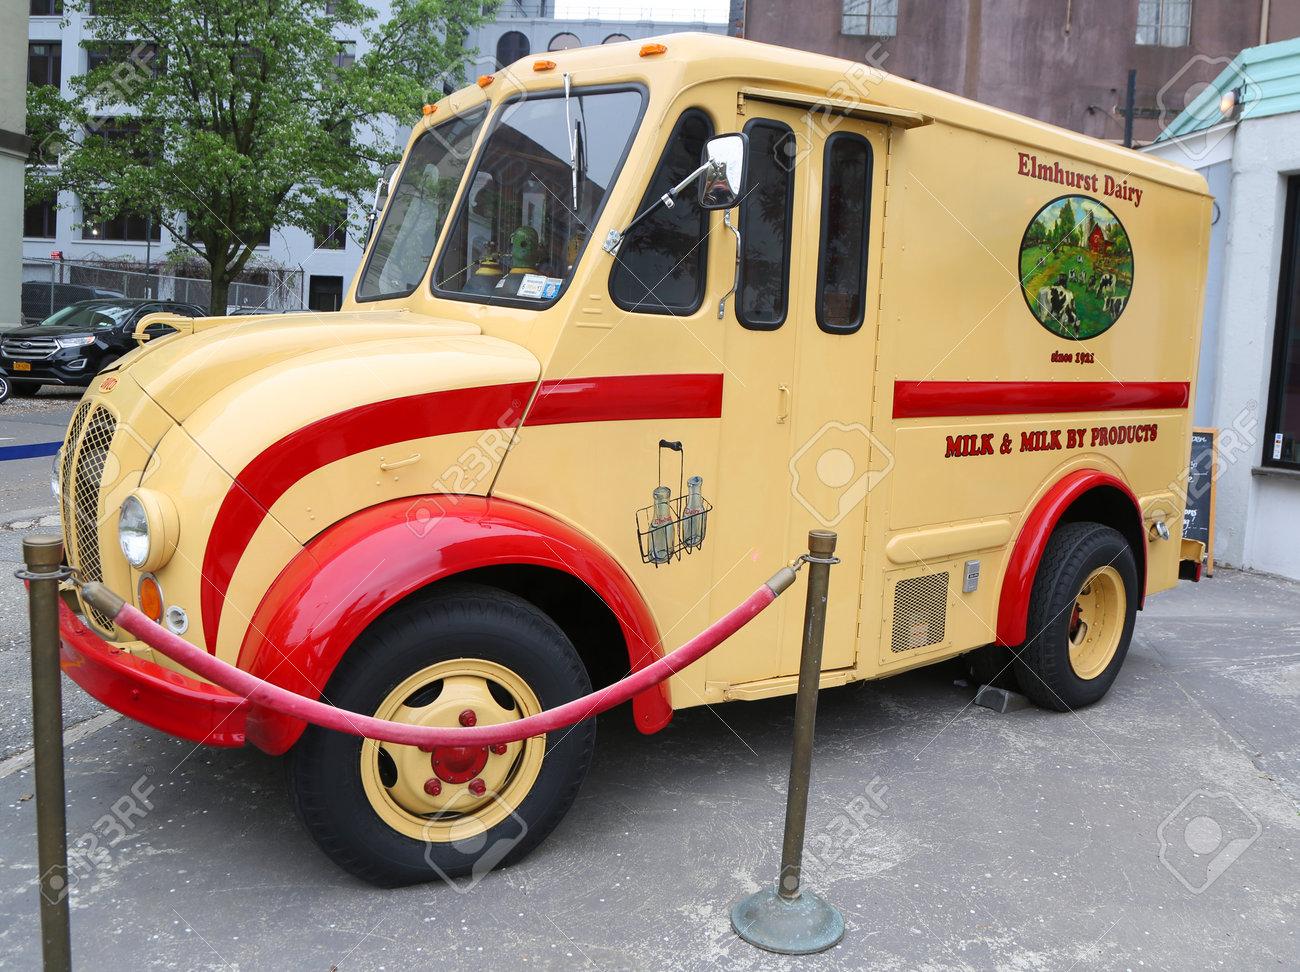 BROOKLYN, NEW YORK - MAY 2, 2019: Vintage Elmhurst Dairy DIVCO